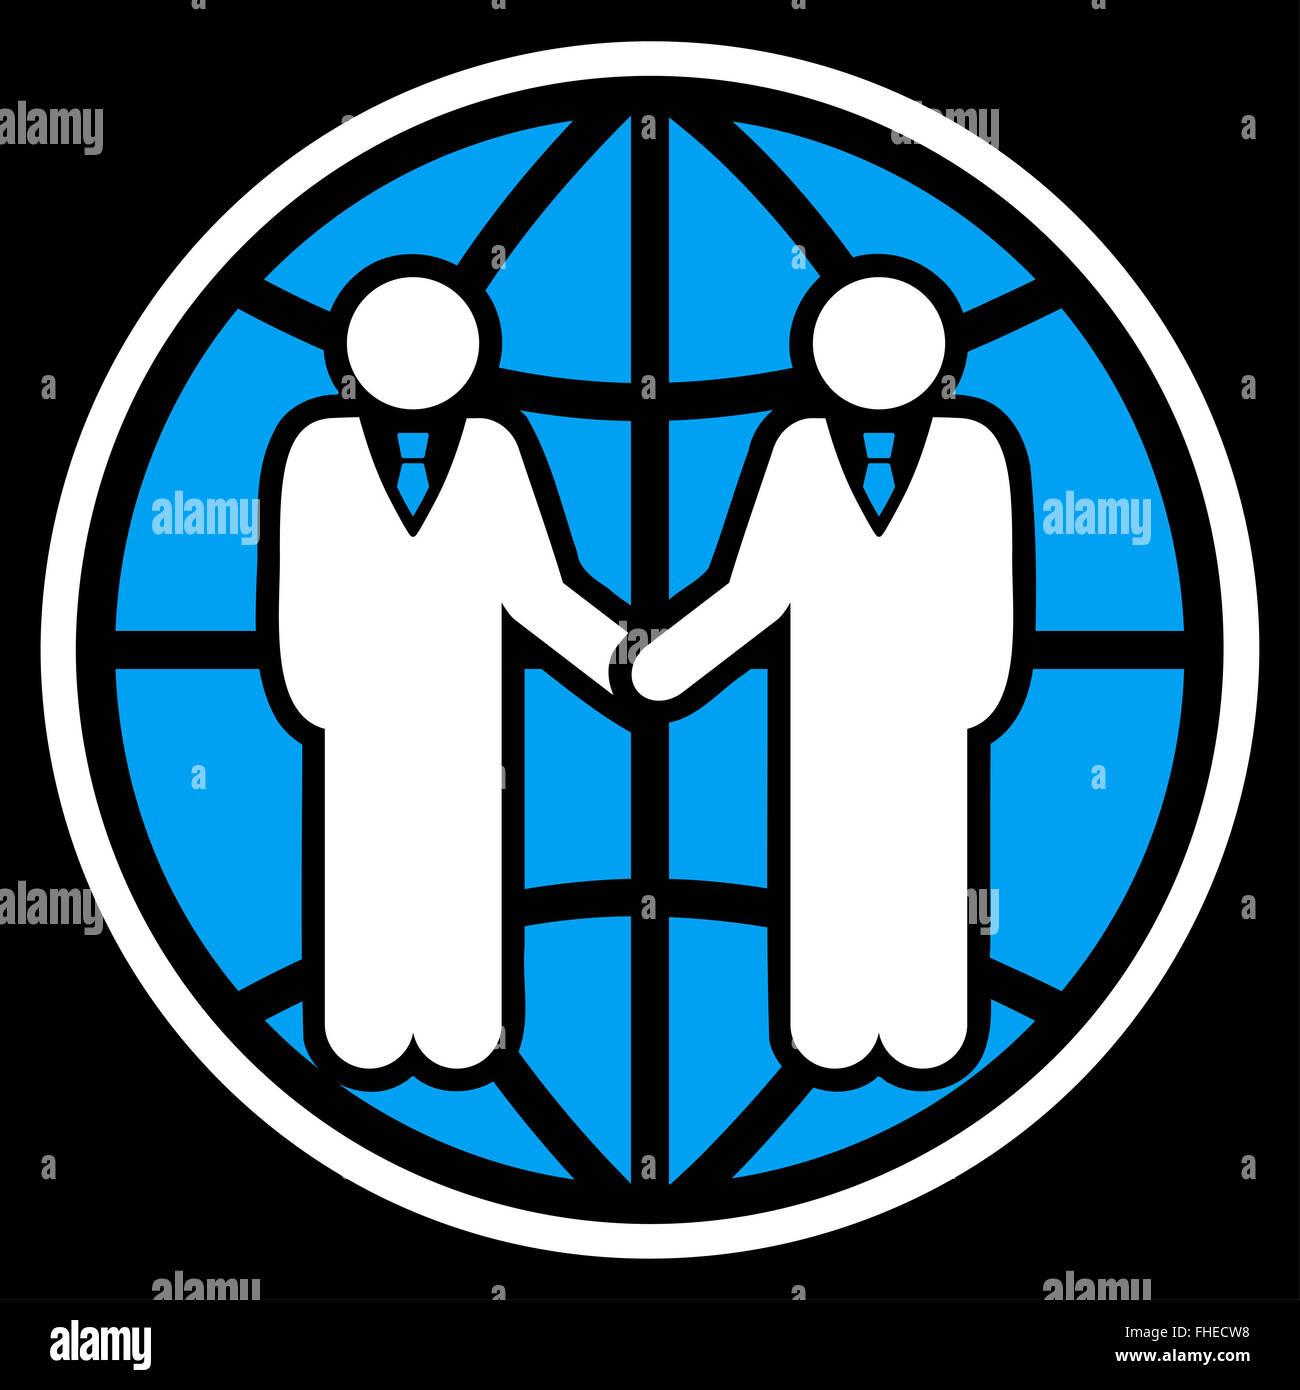 Global partnership icon - Stock Image